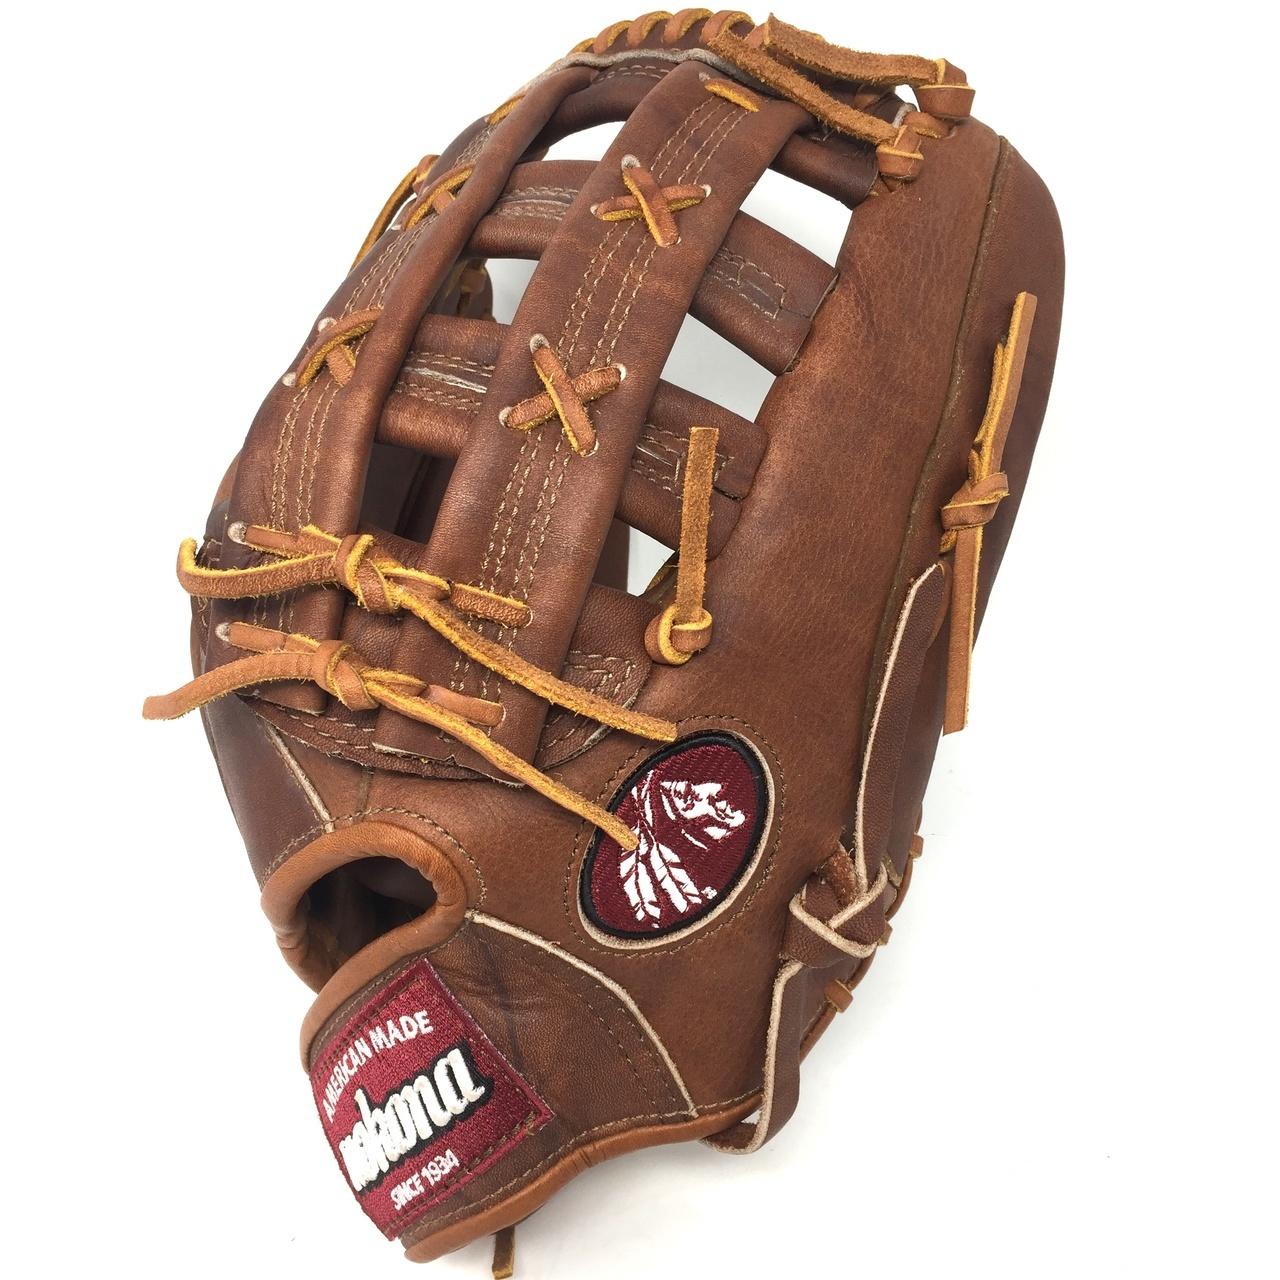 nokona softball glove wb-1275h